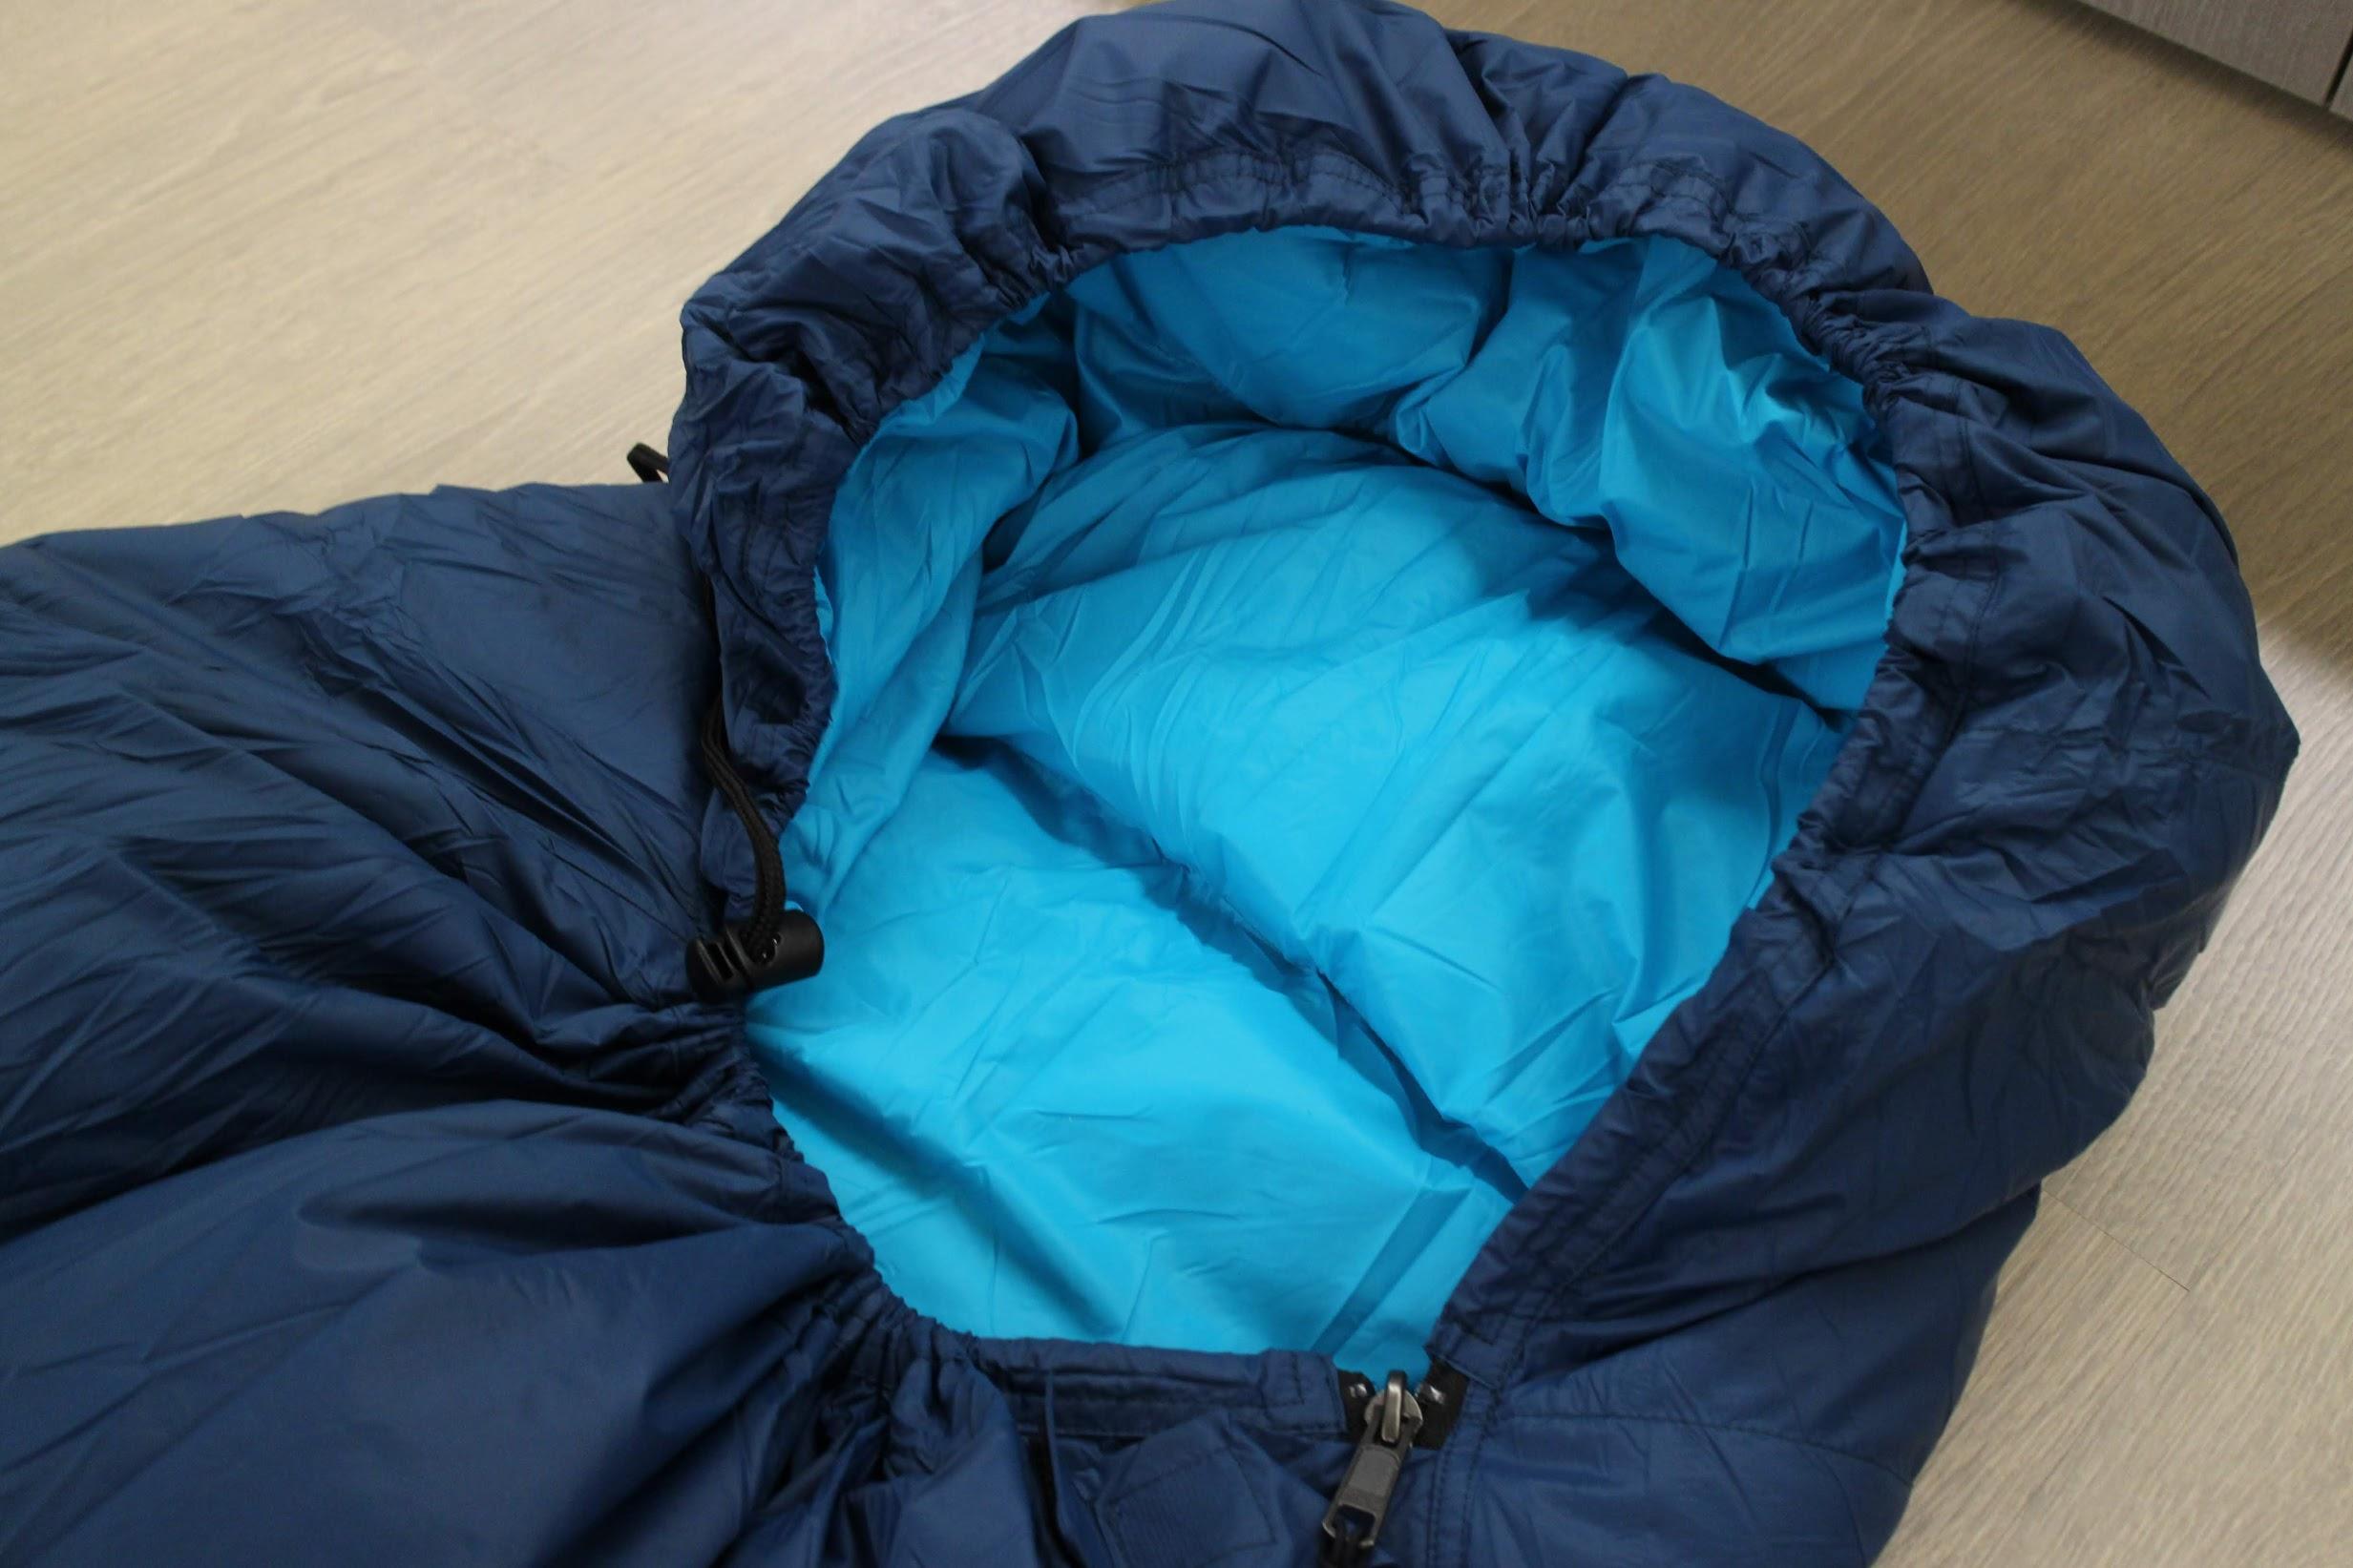 SEAN's羽絨睡袋